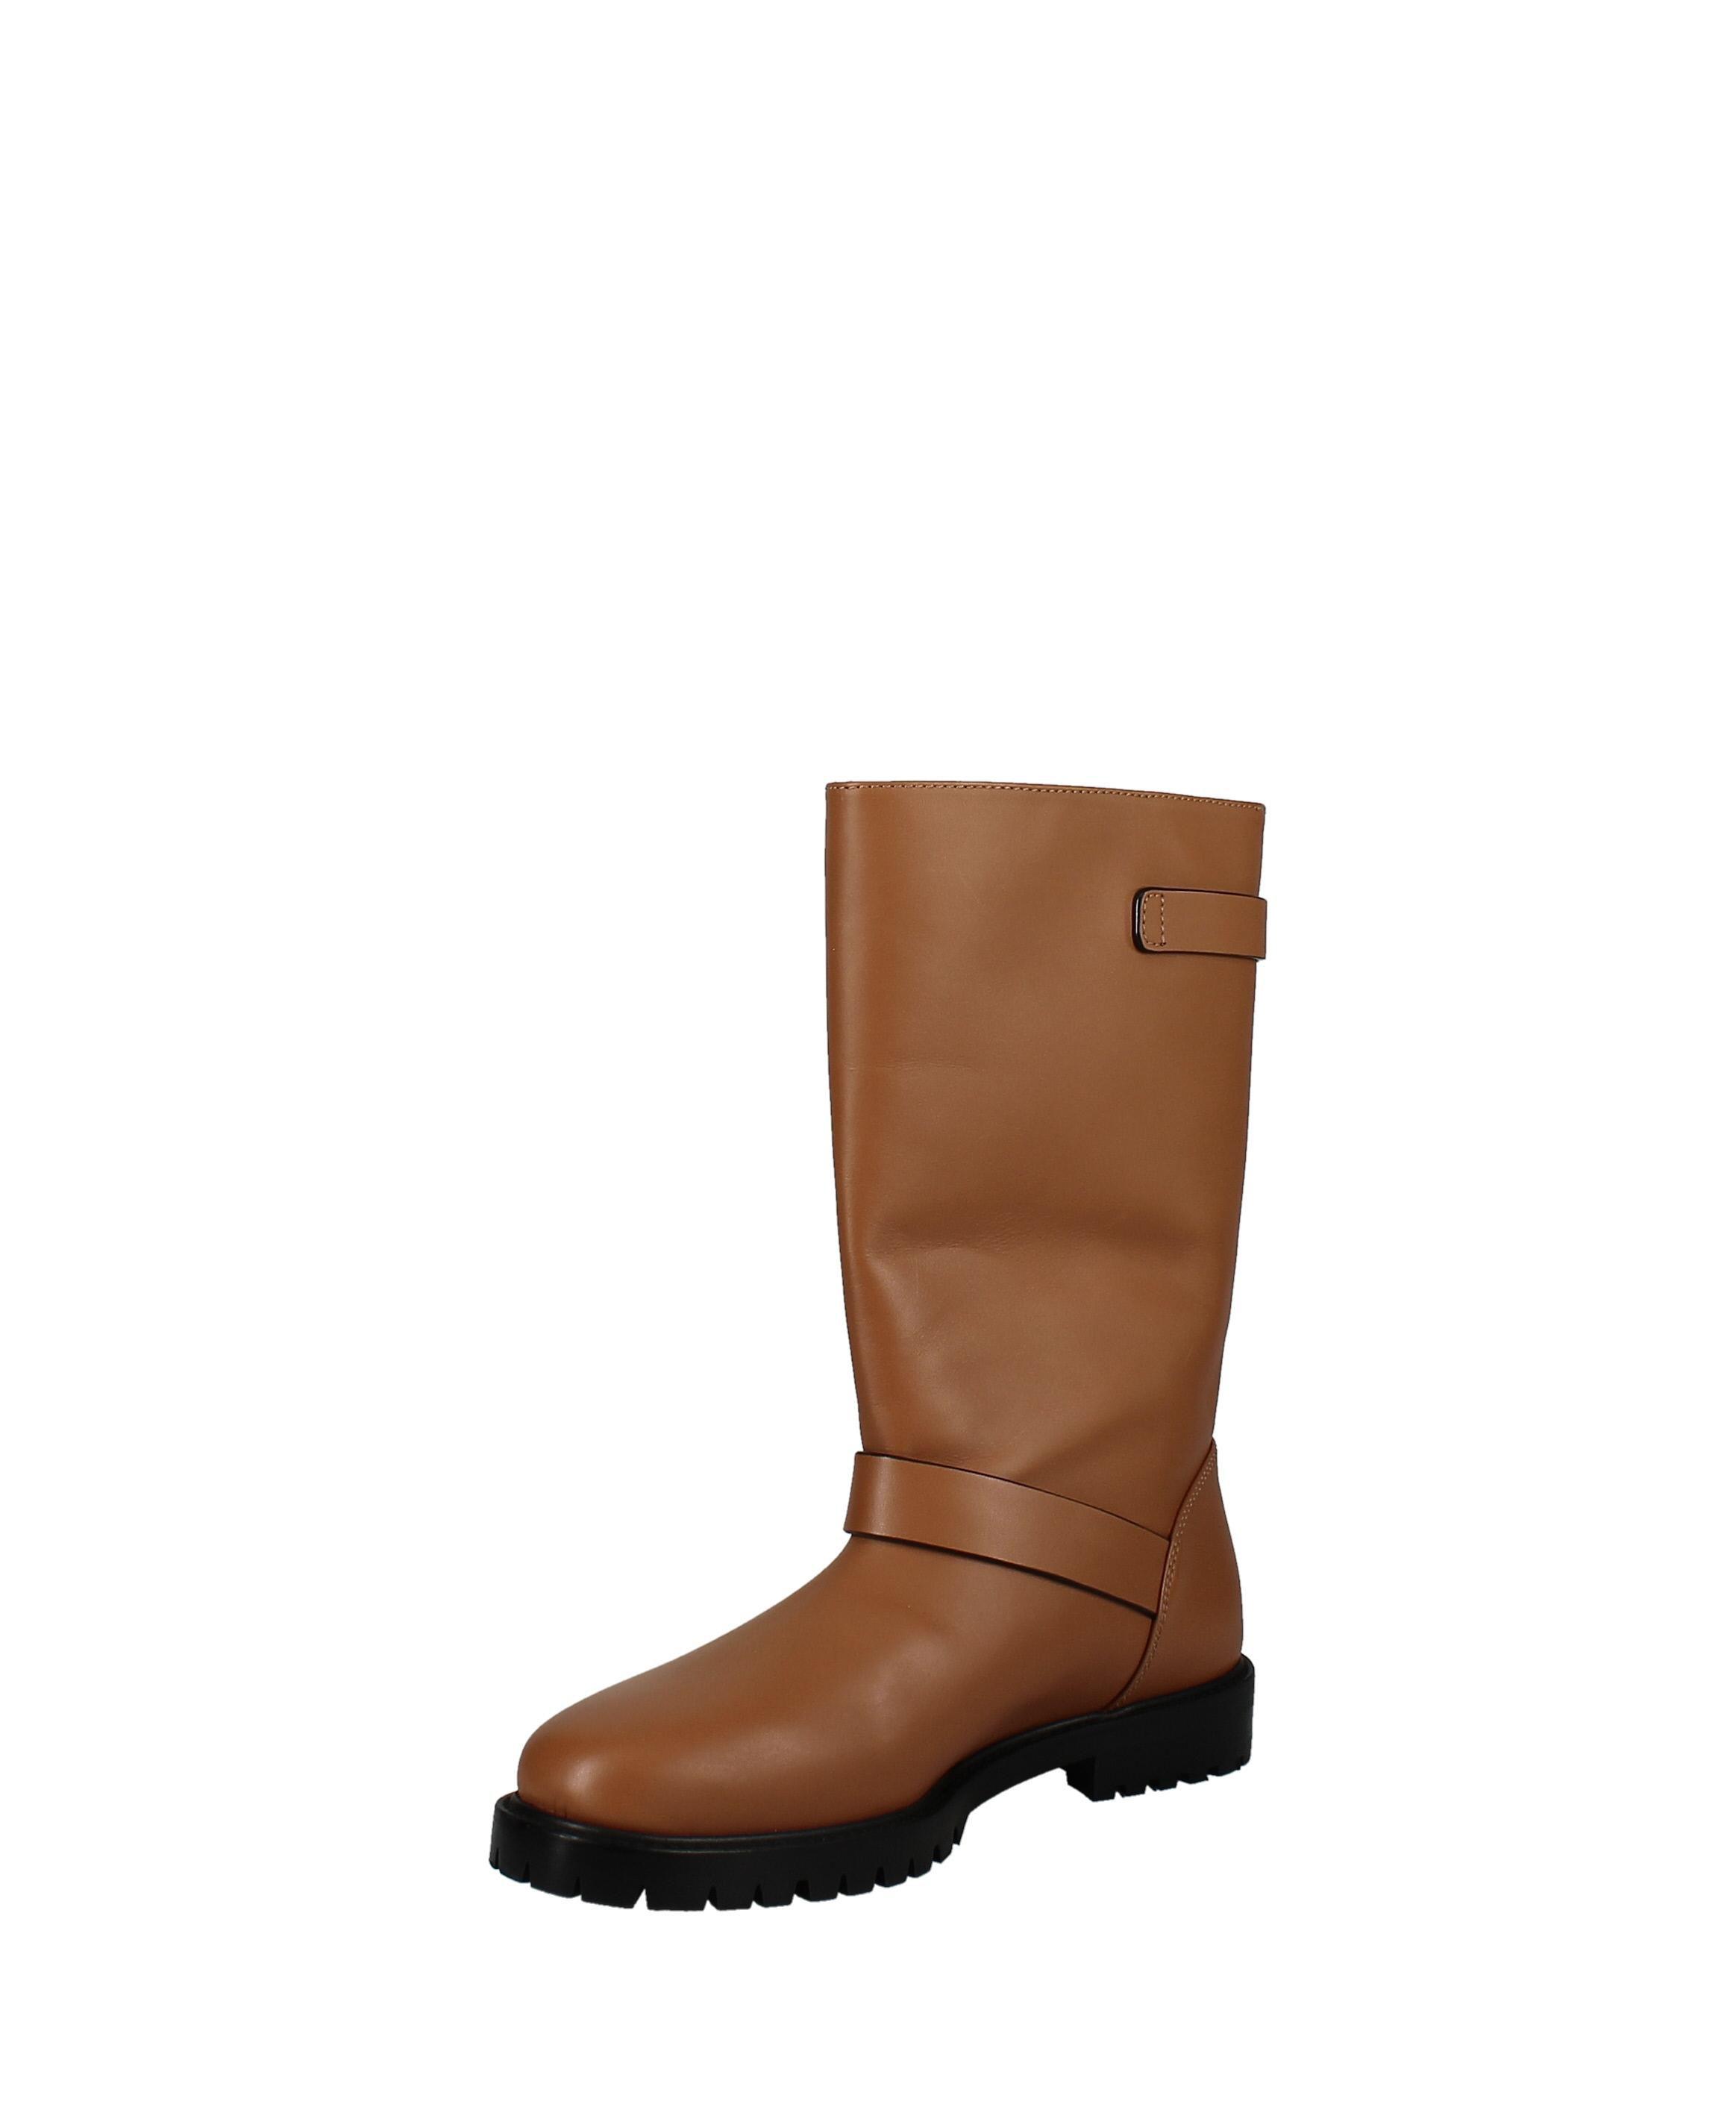 Lafayette 148 | Jordan Moto Leather Boot | Tan | 7 M